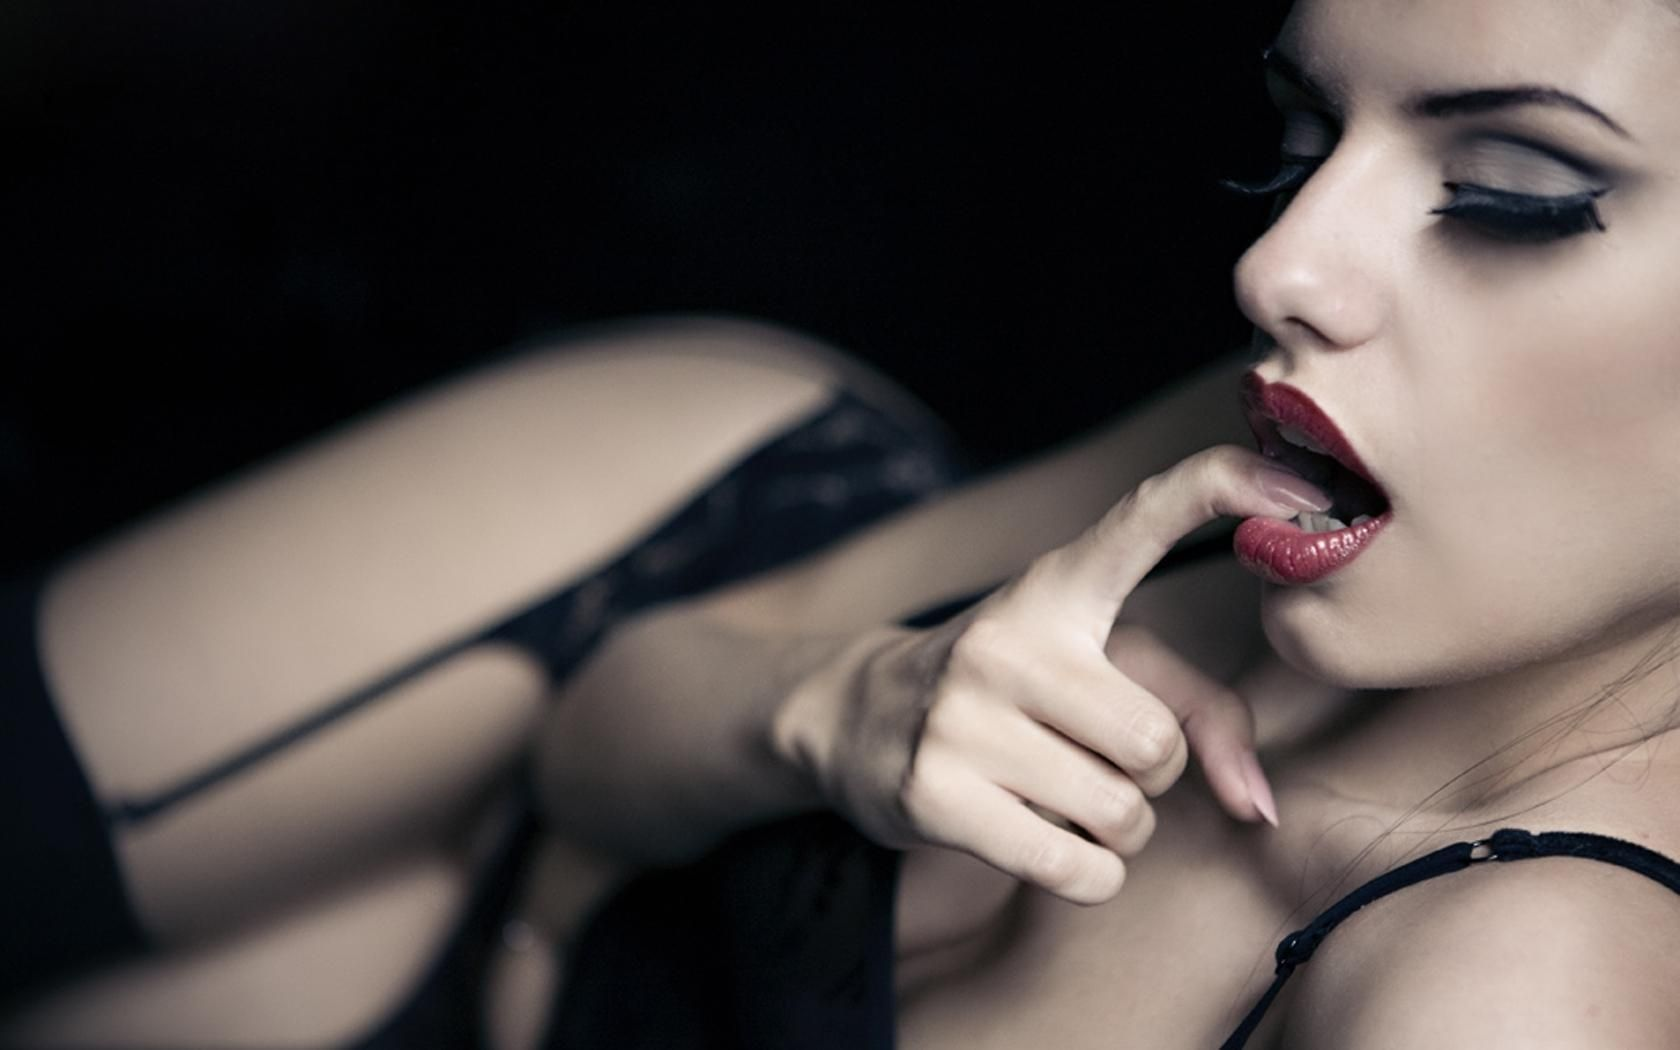 #hot #kiss #love #girl #sexy